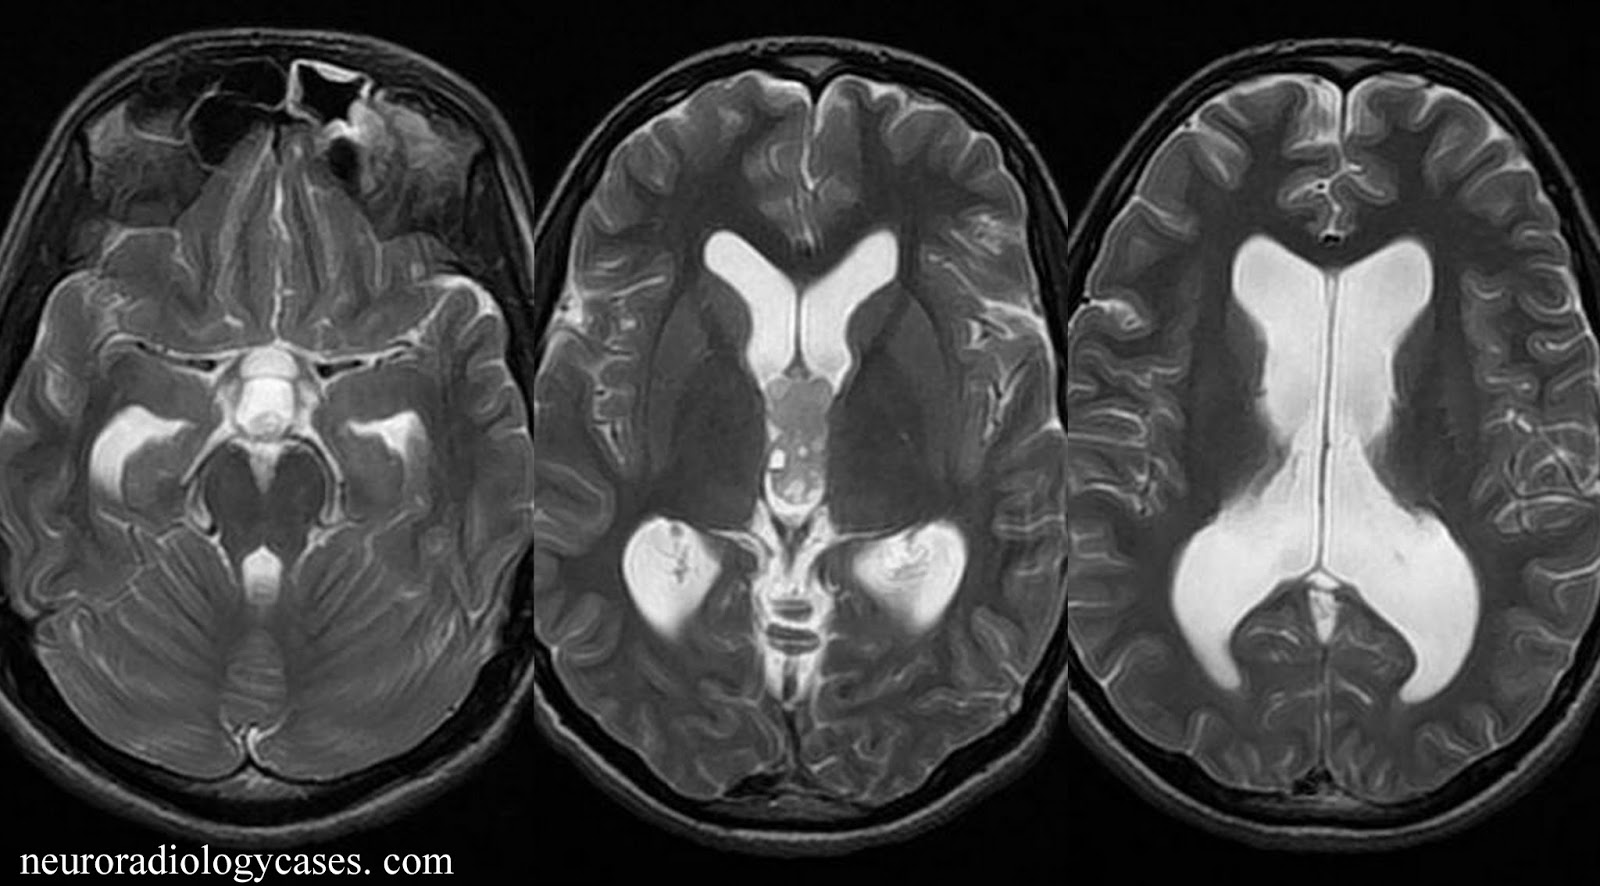 Dr Balaji Anvekar's Neuroradiology Cases: CSF shunt imaging